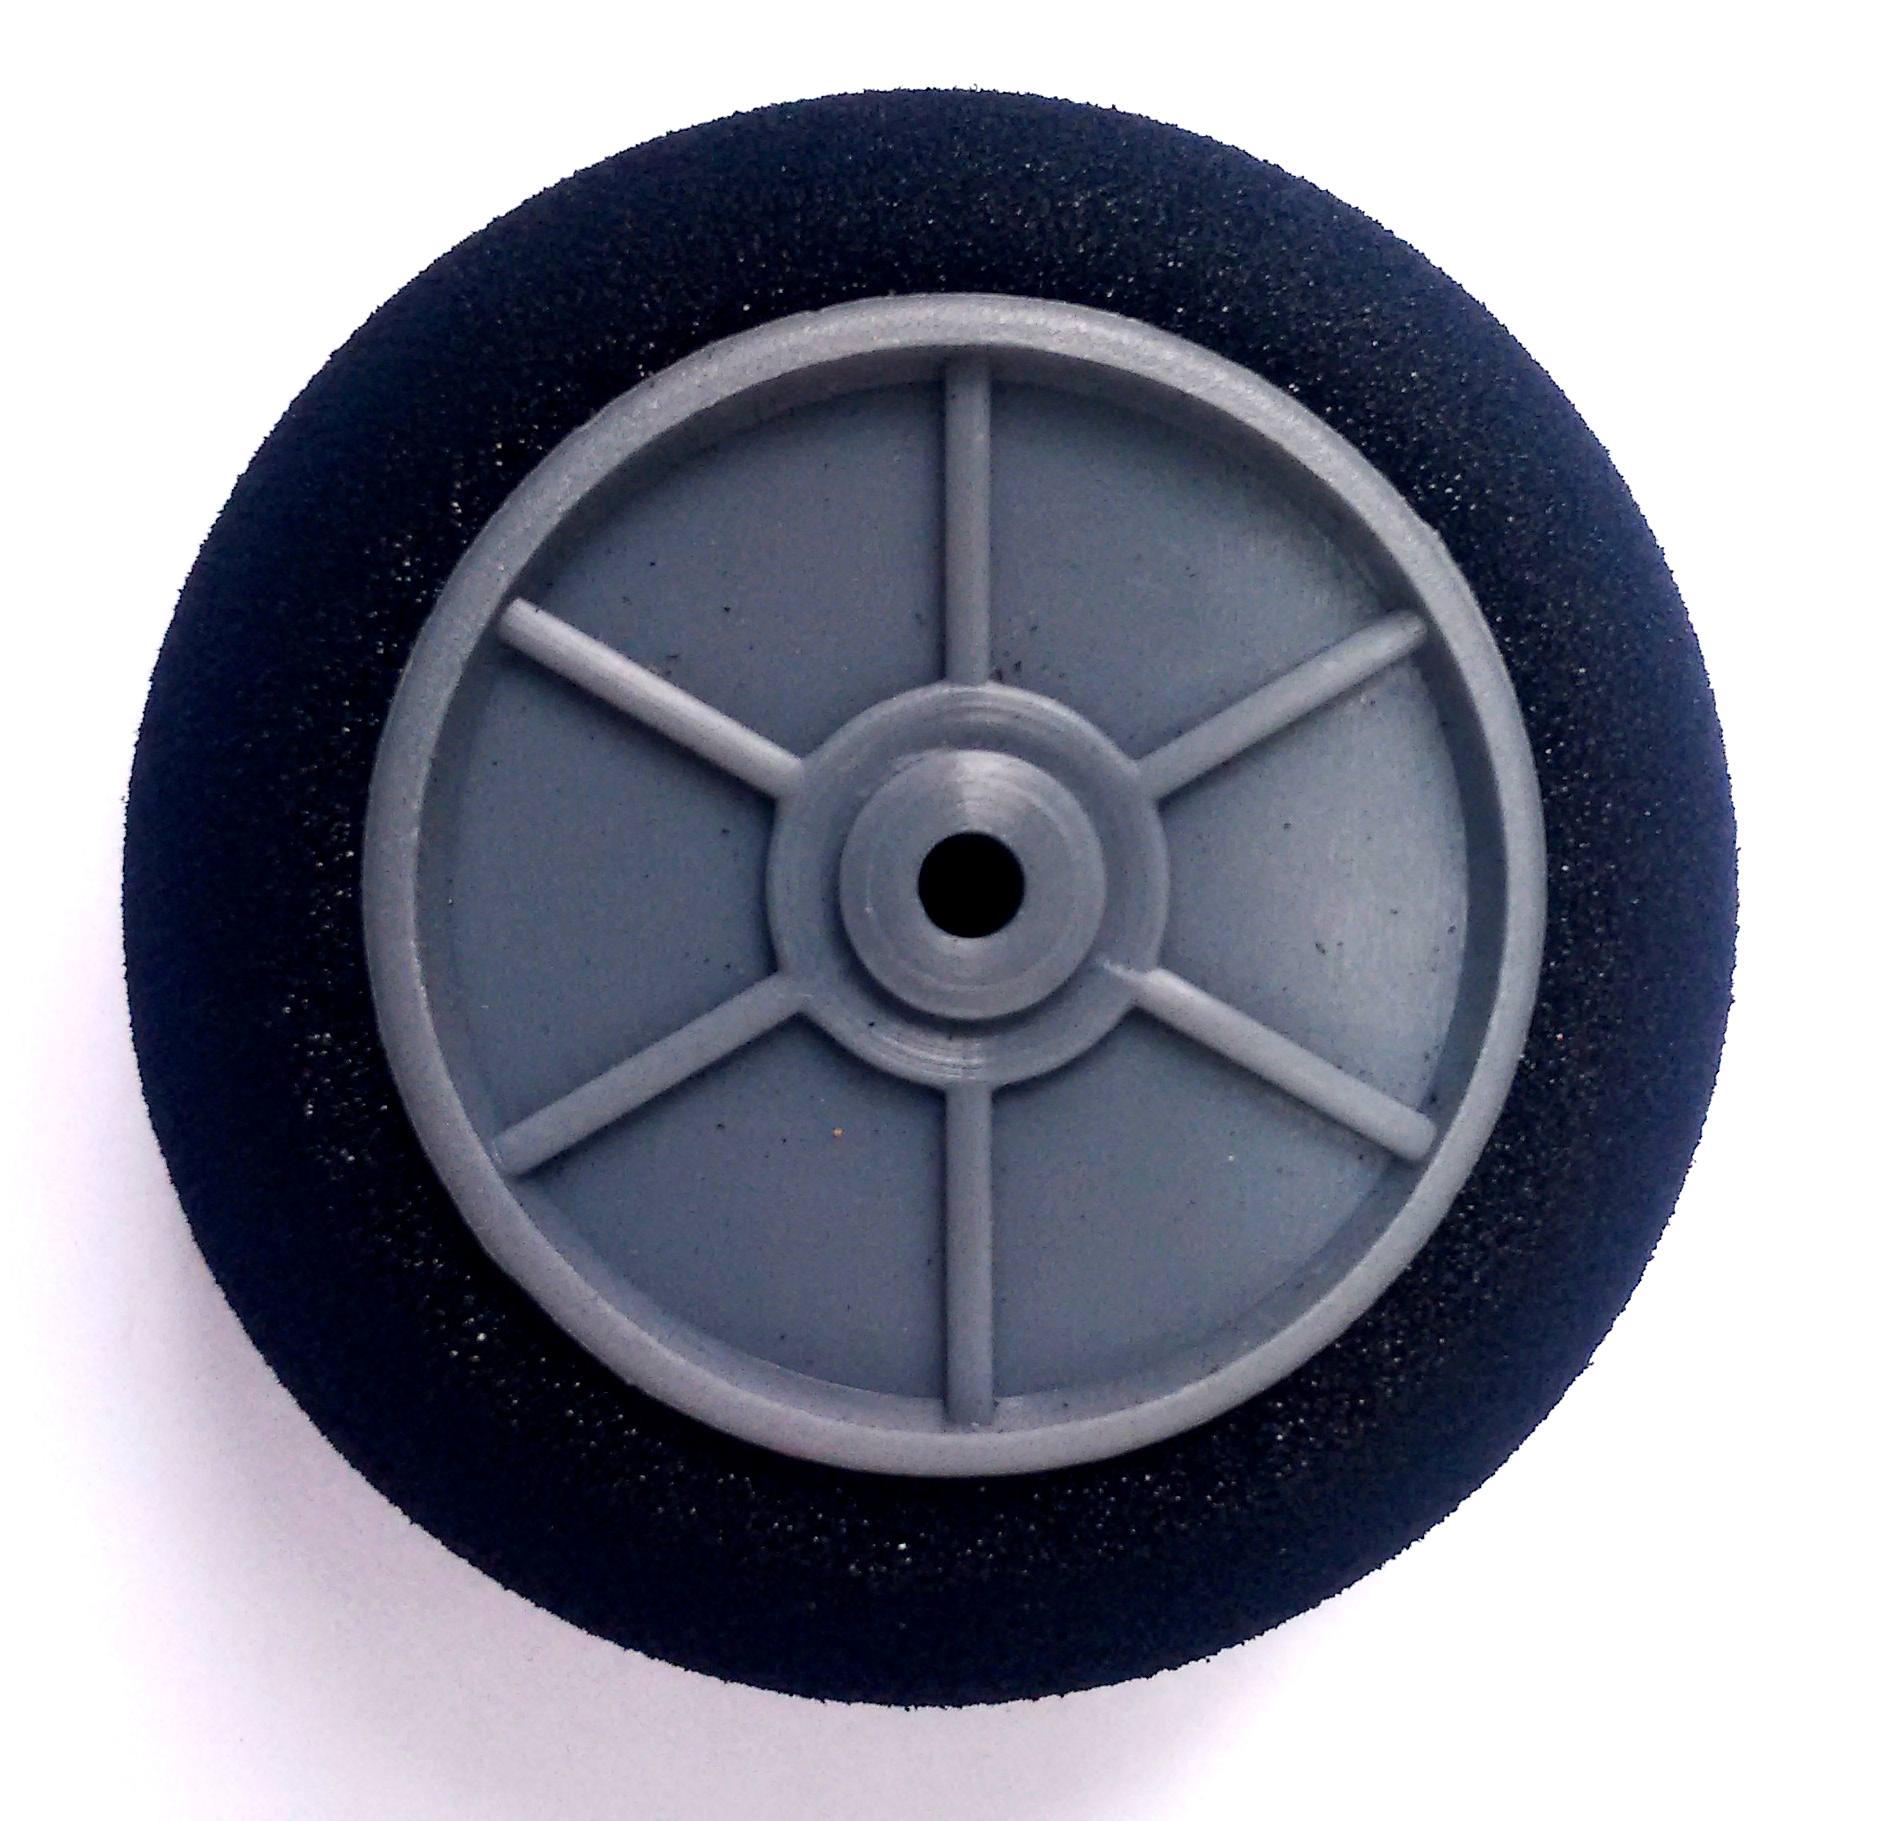 9860 - Roda Light Foam (Diâmetro: 50mm, Largura: 18.5mm)